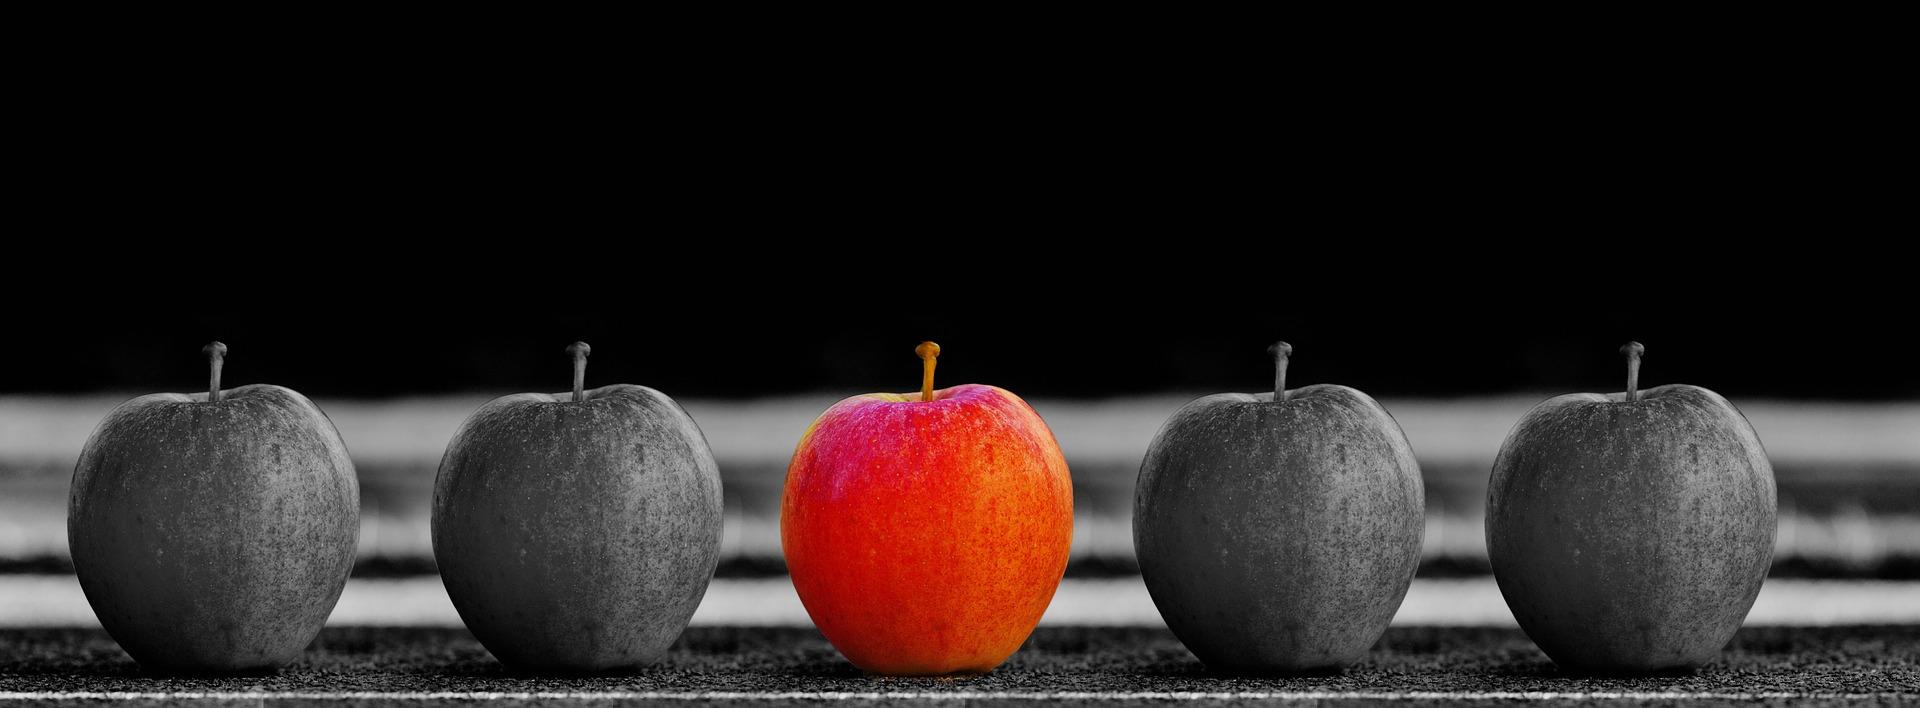 apple-1594742_1920